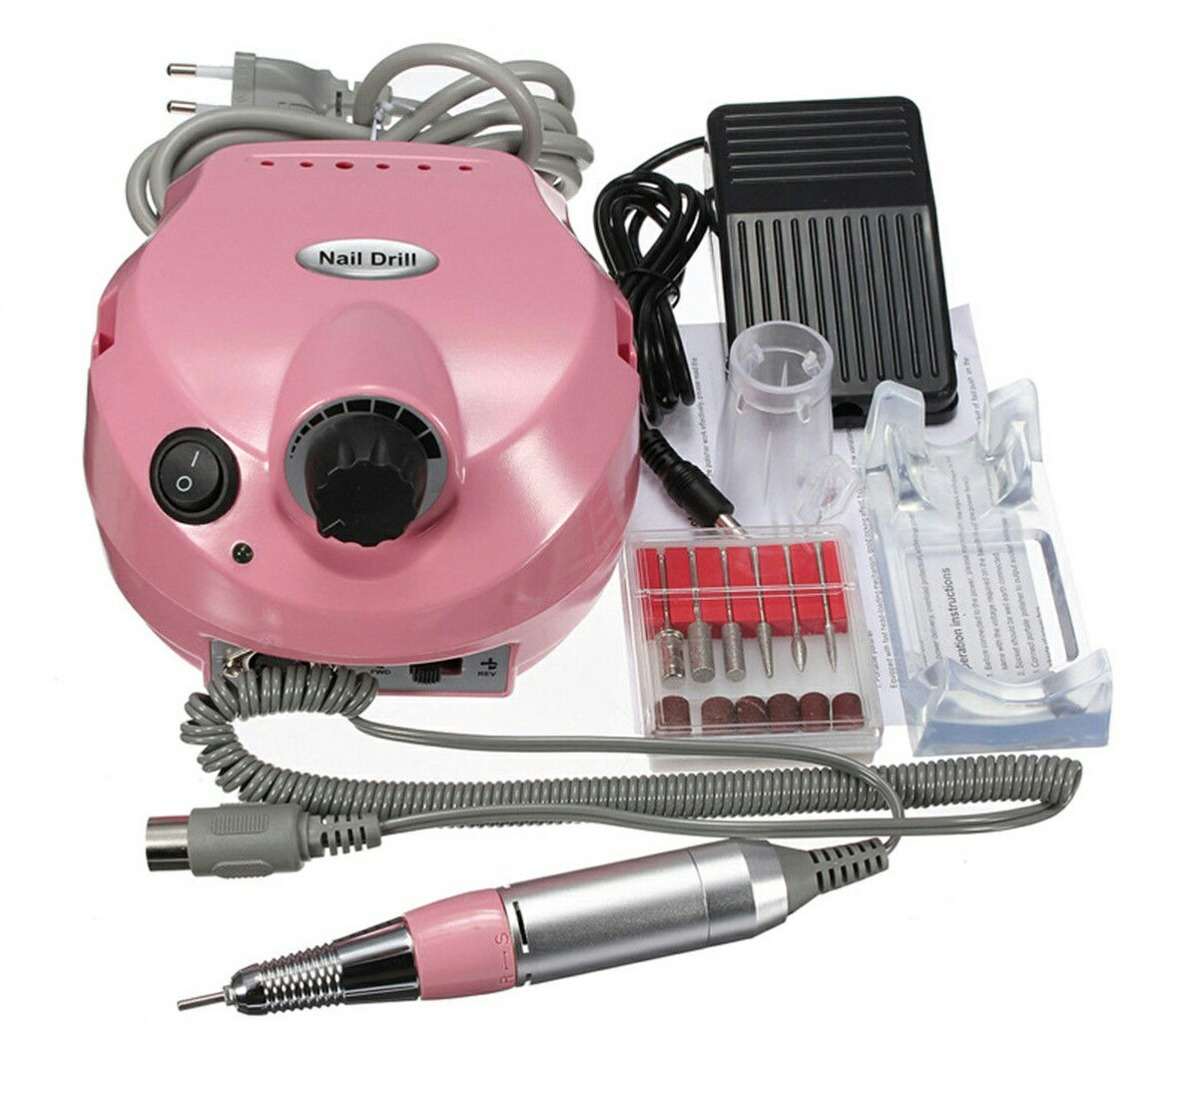 Pulidor De Uñas Electrico Profesional Incluye Pedal Manicure - S ...